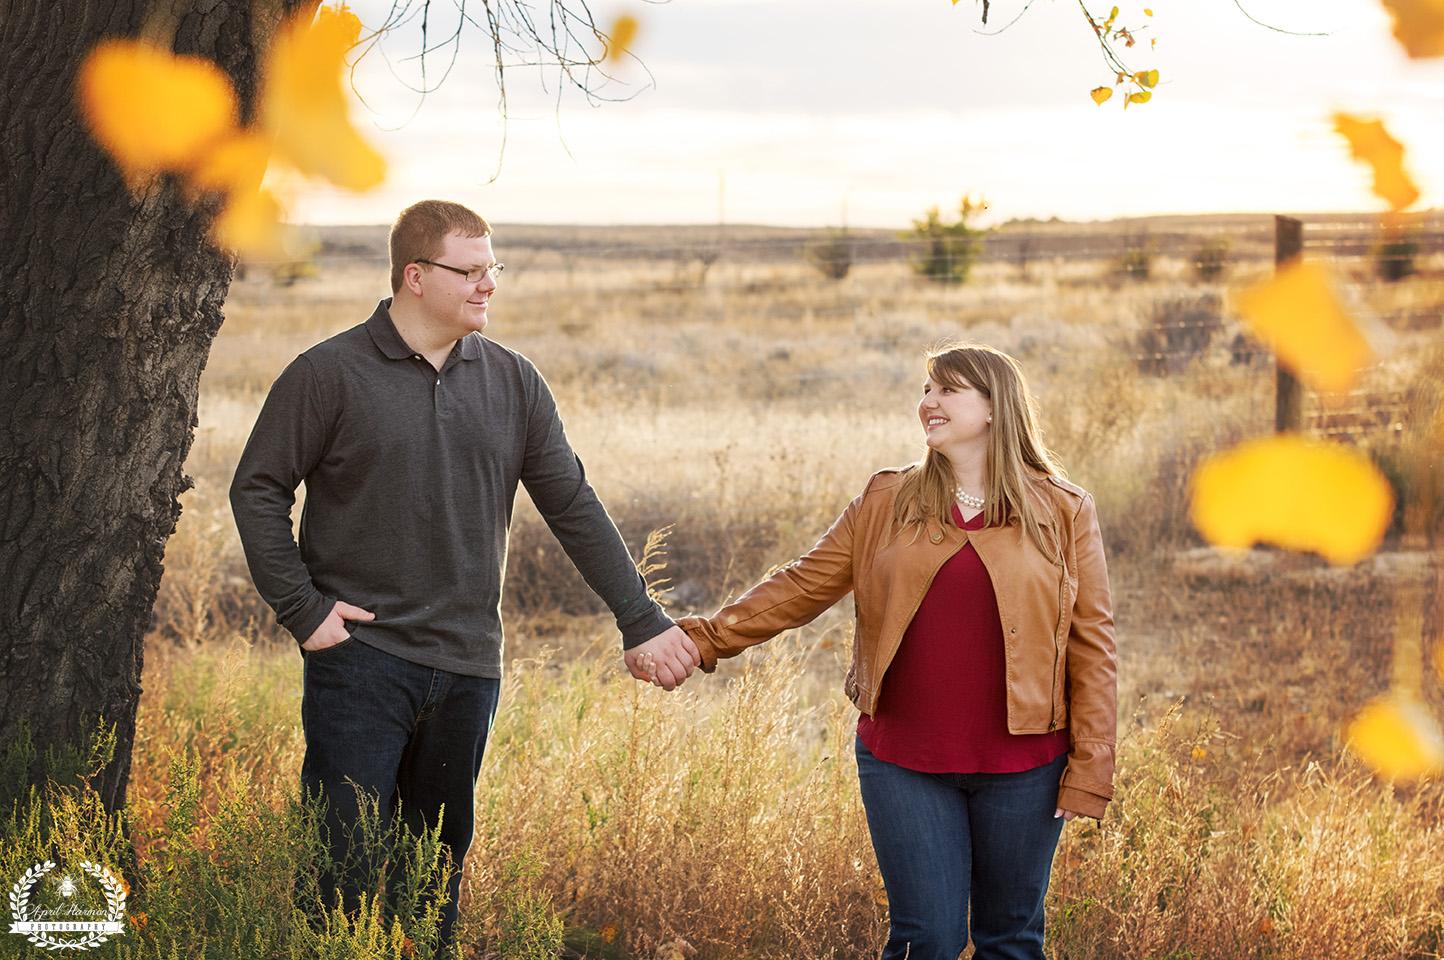 Engagement photography Garden city ks